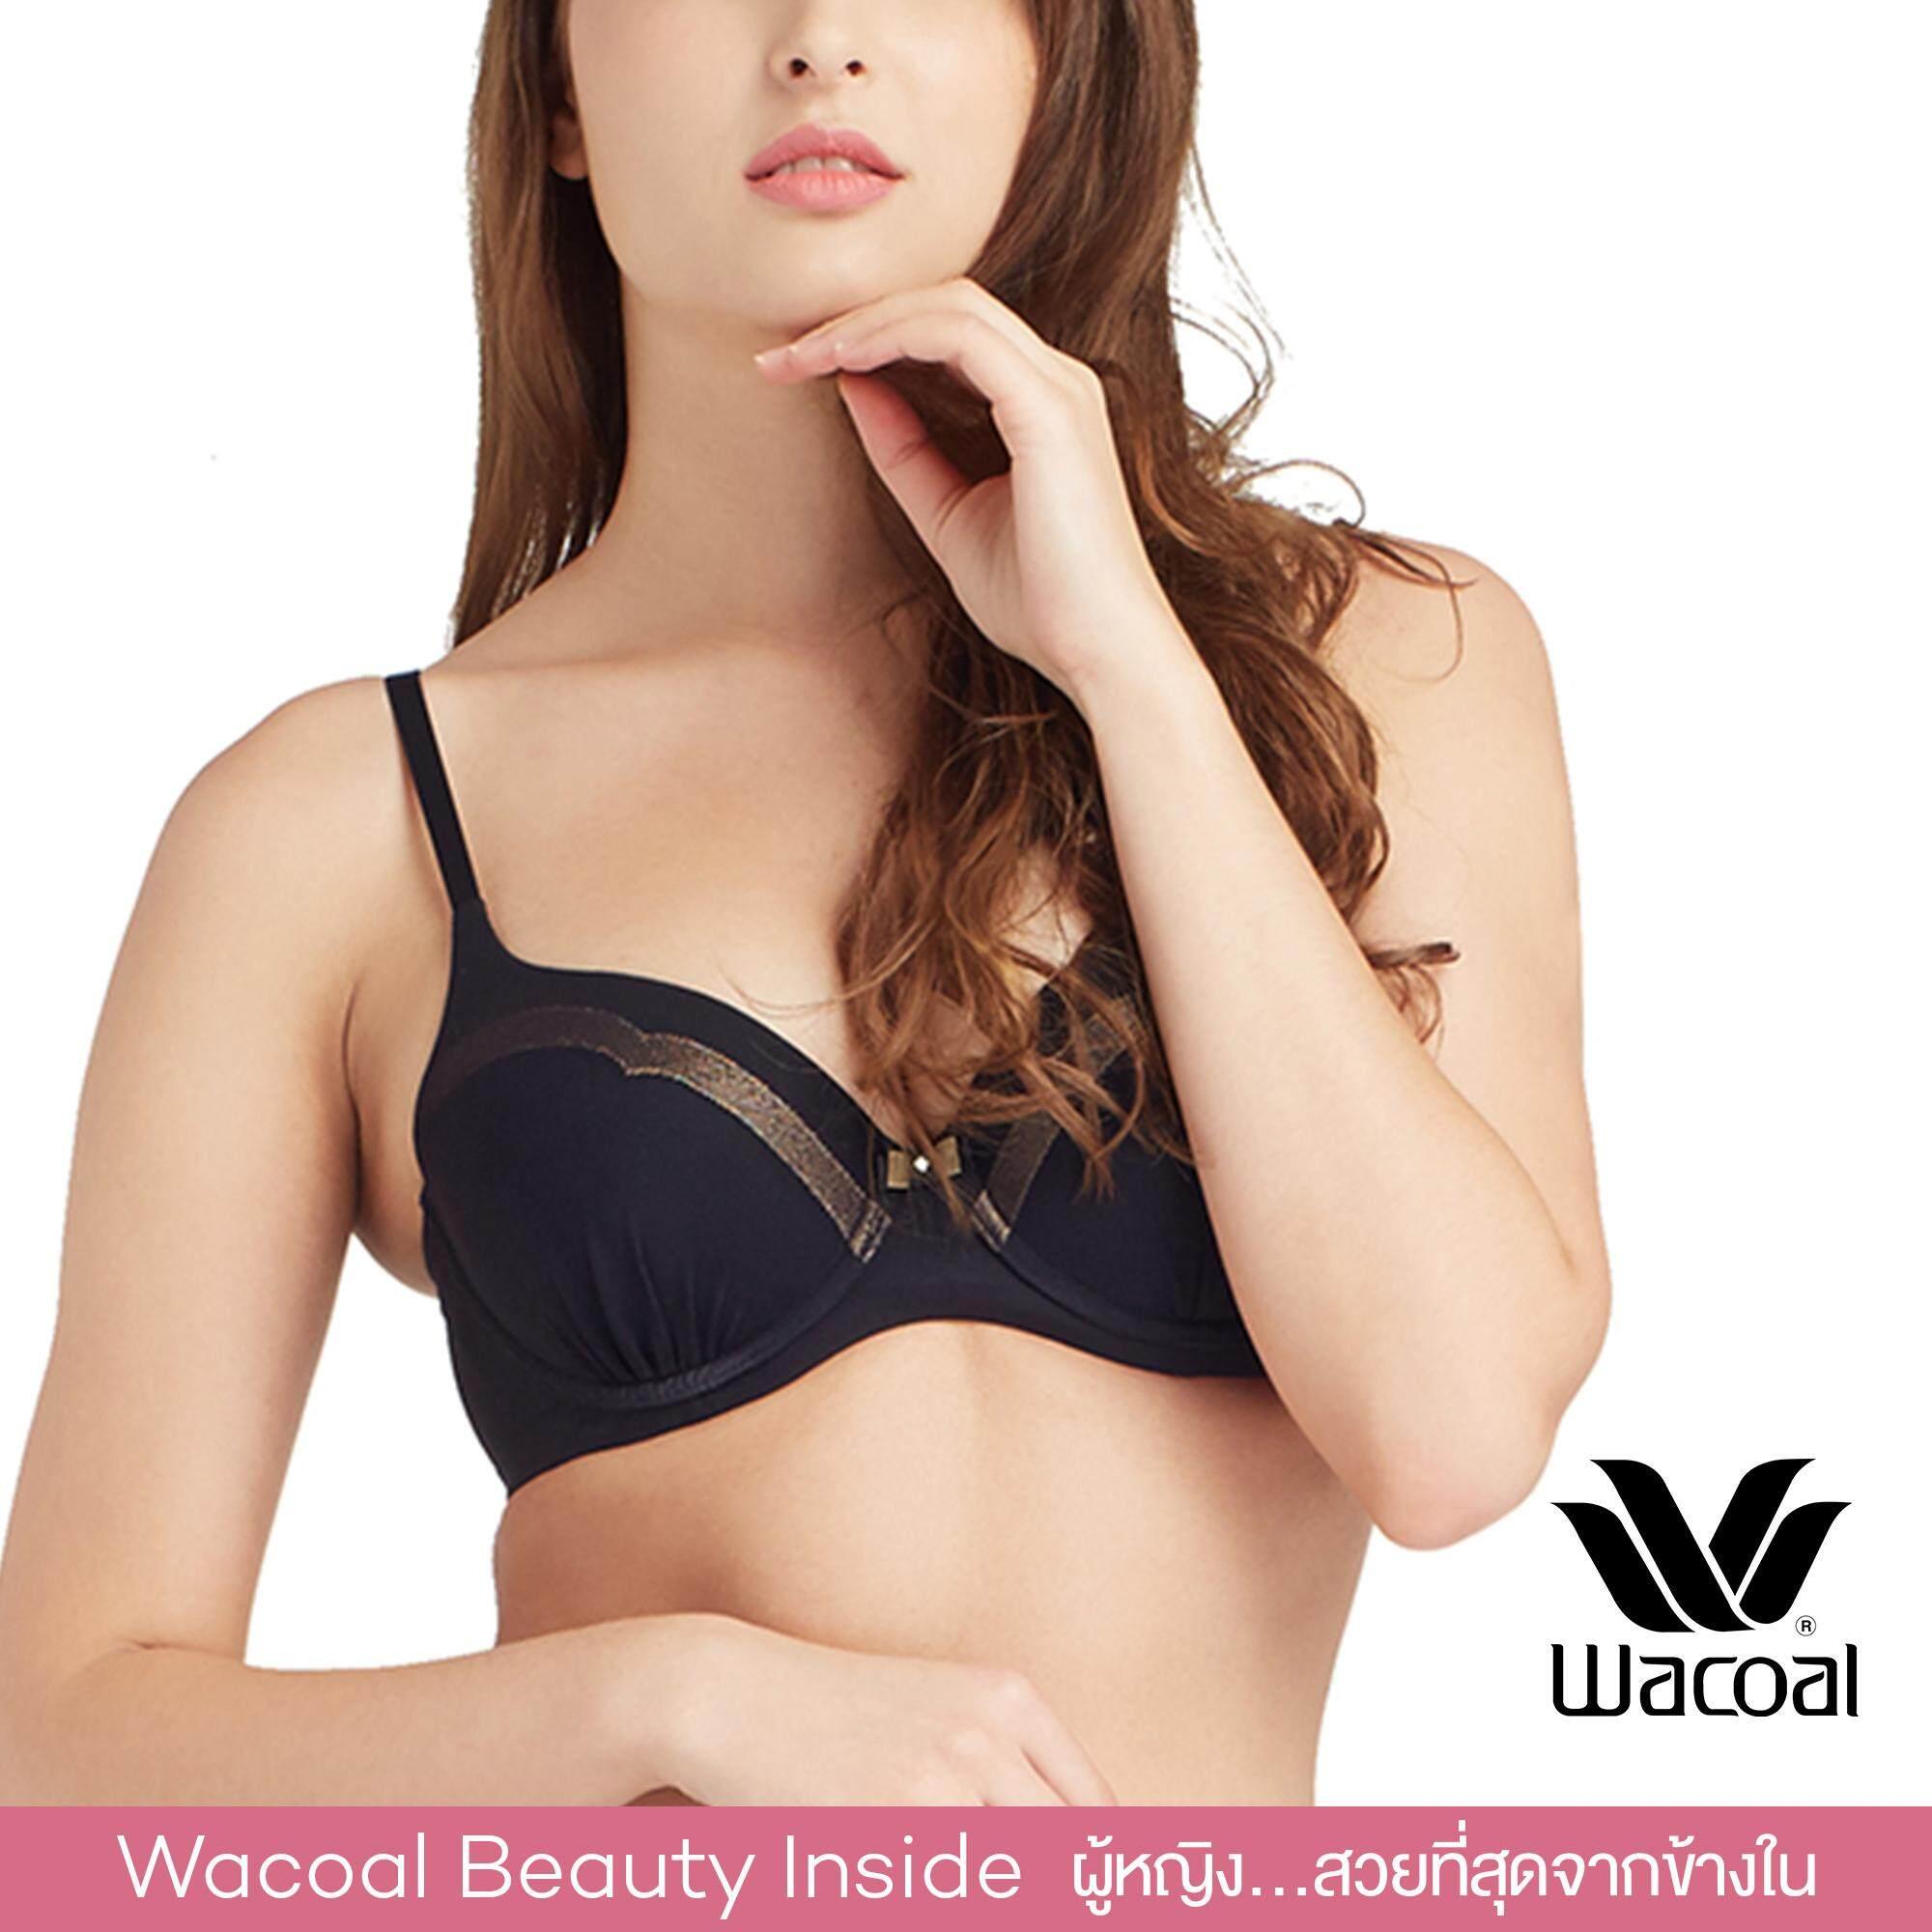 Wacoal Best Seller บราเก็บกระชับ 4/5 cup (สีดำ/BLACK) - WB7847BL